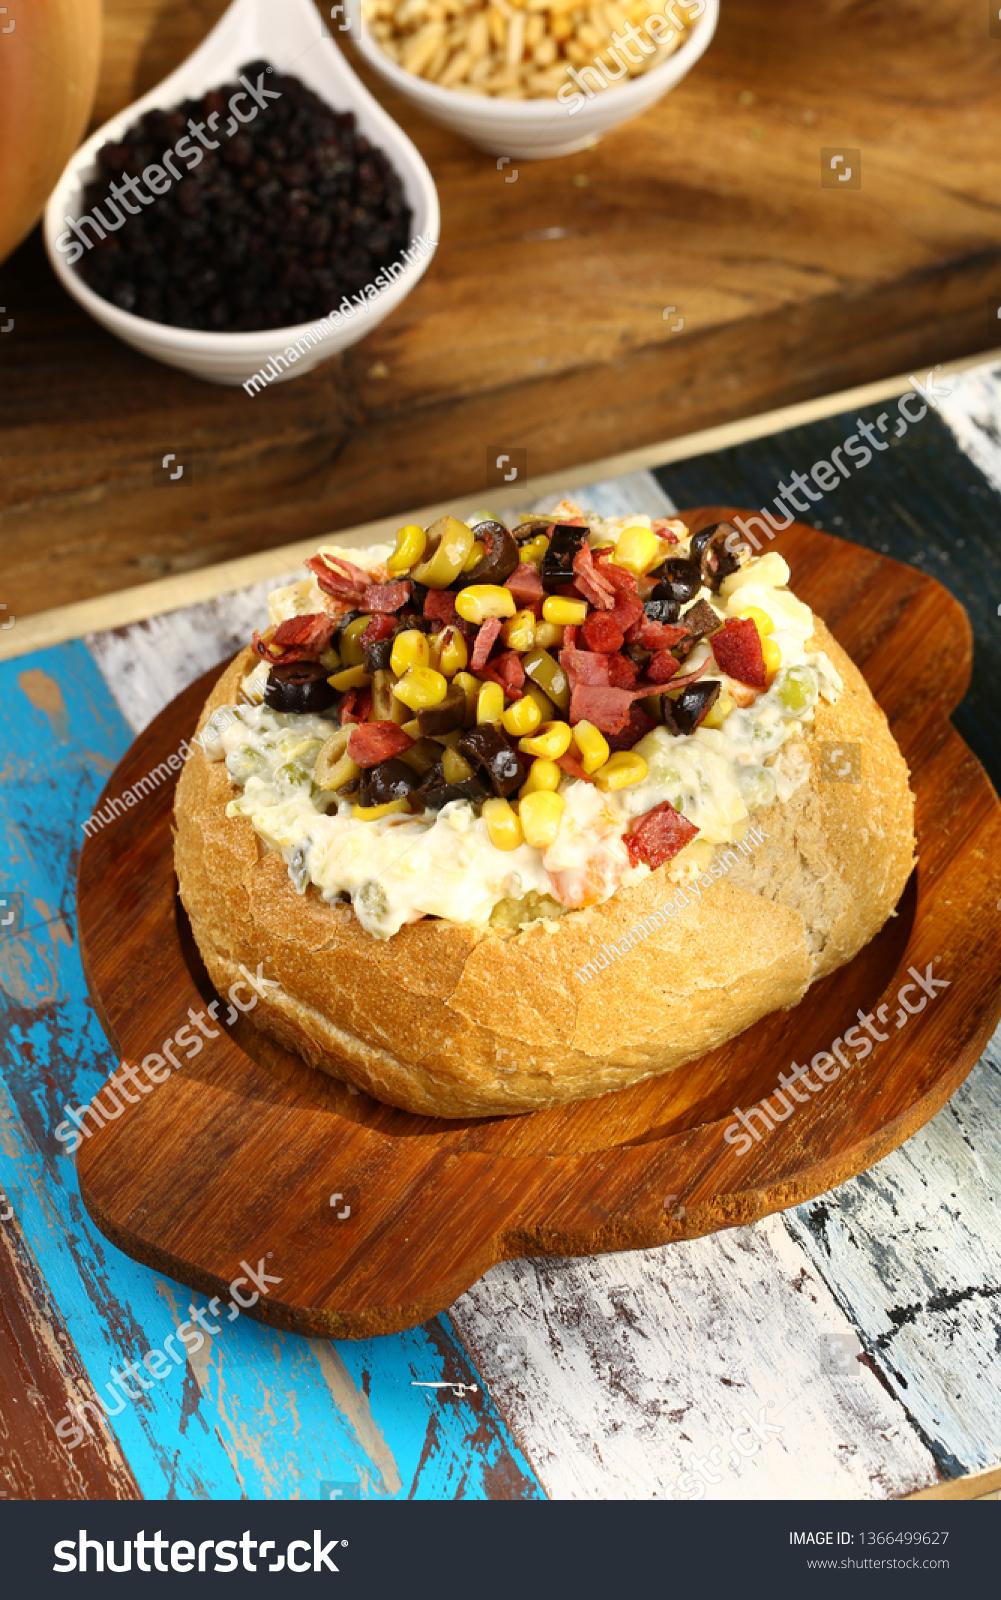 Kumpir Recipe : kumpir, recipe, Kumpir, Baked, Potato, Vegetable, Bread, Stock, Photo, (Edit, 1366499627